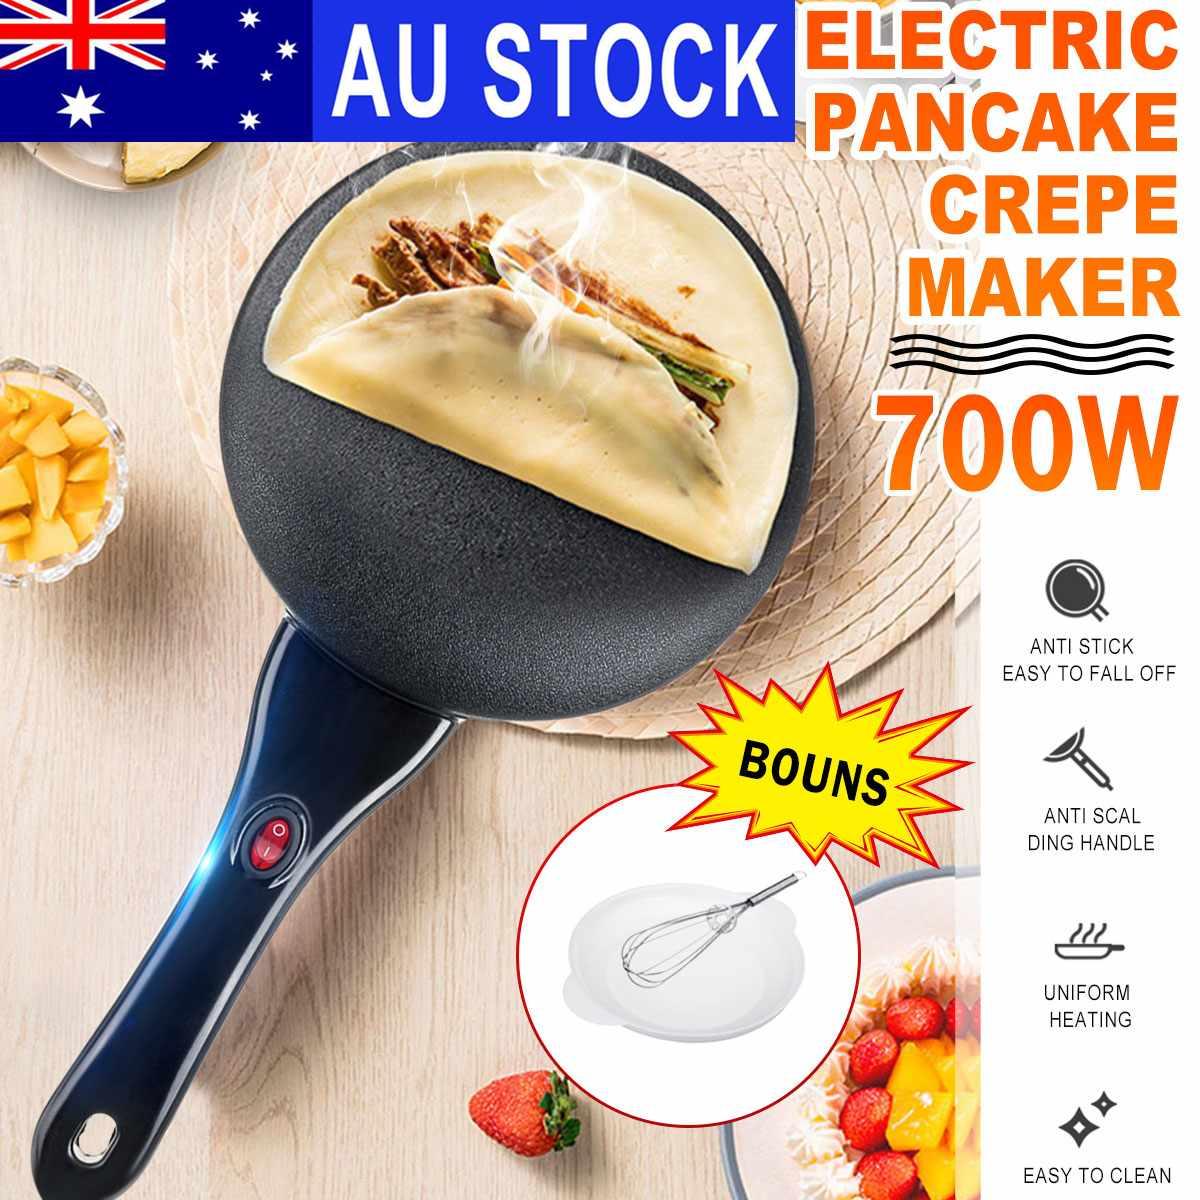 220V 700W Household Non-Stick Crepe Maker Pan Electric Pancake Cake Machine Frying Griddle Portable Kitchen Baking Tools